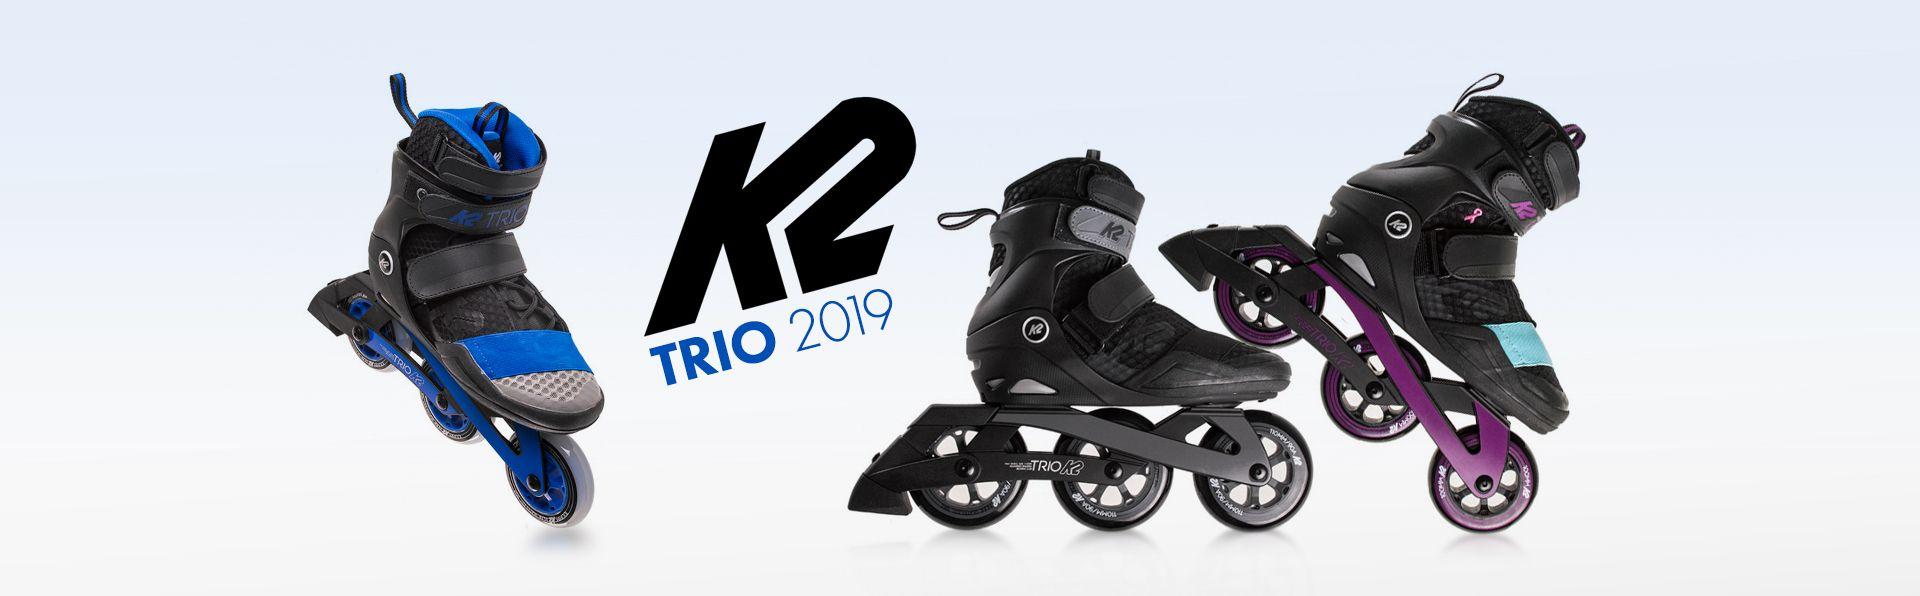 K2 - Trio